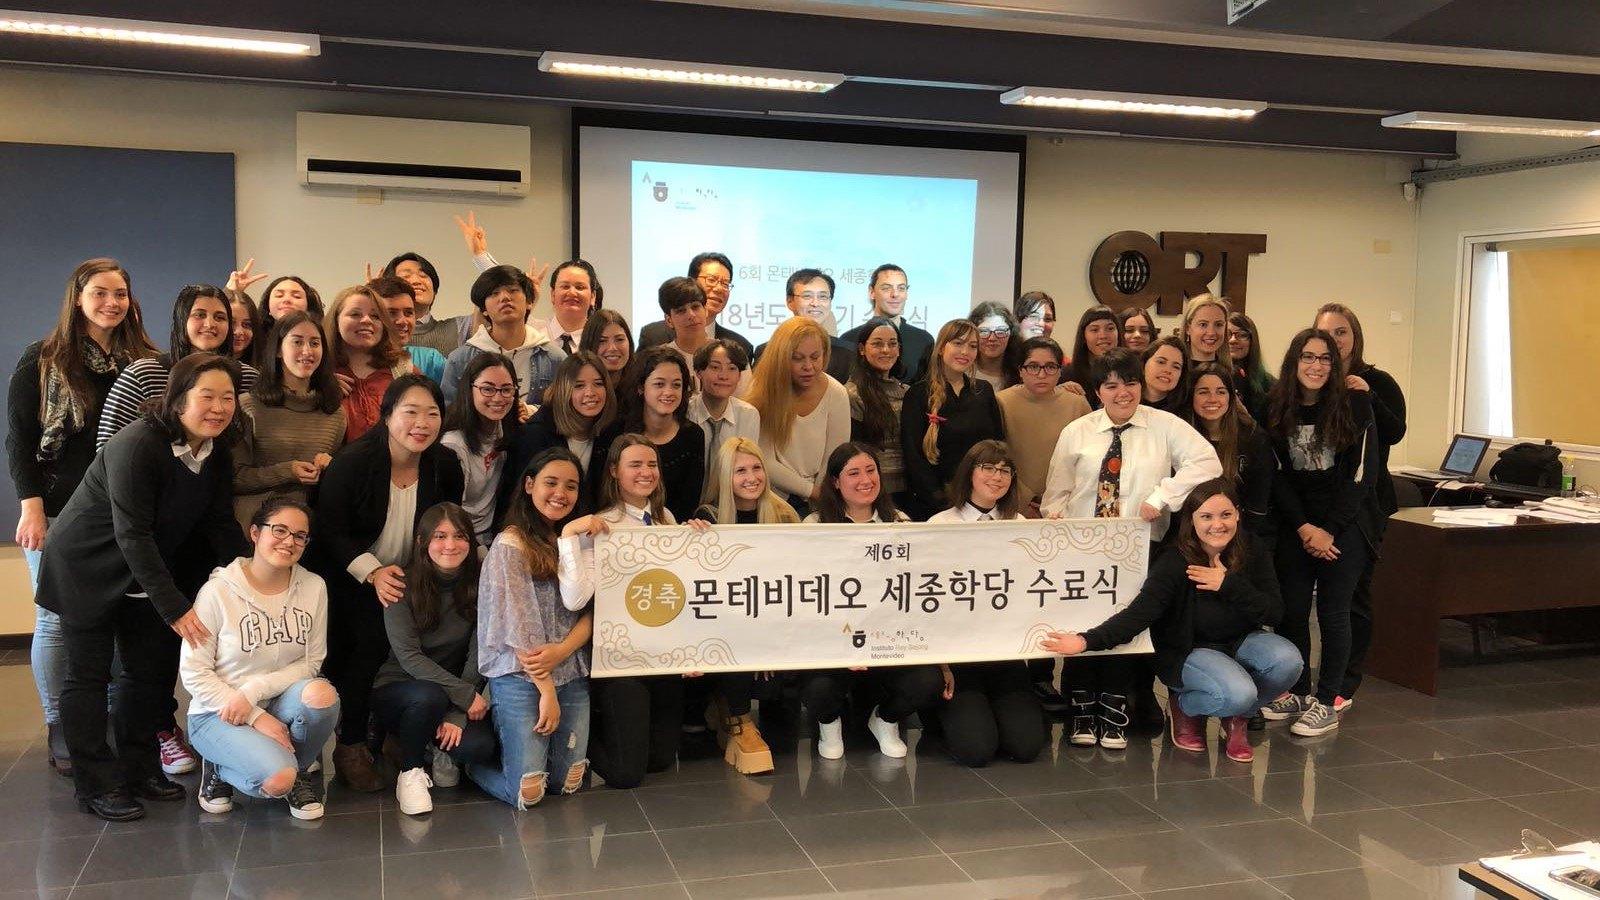 Ceremonia de fin de semestre del Instituto Rey Sejong Montevideo